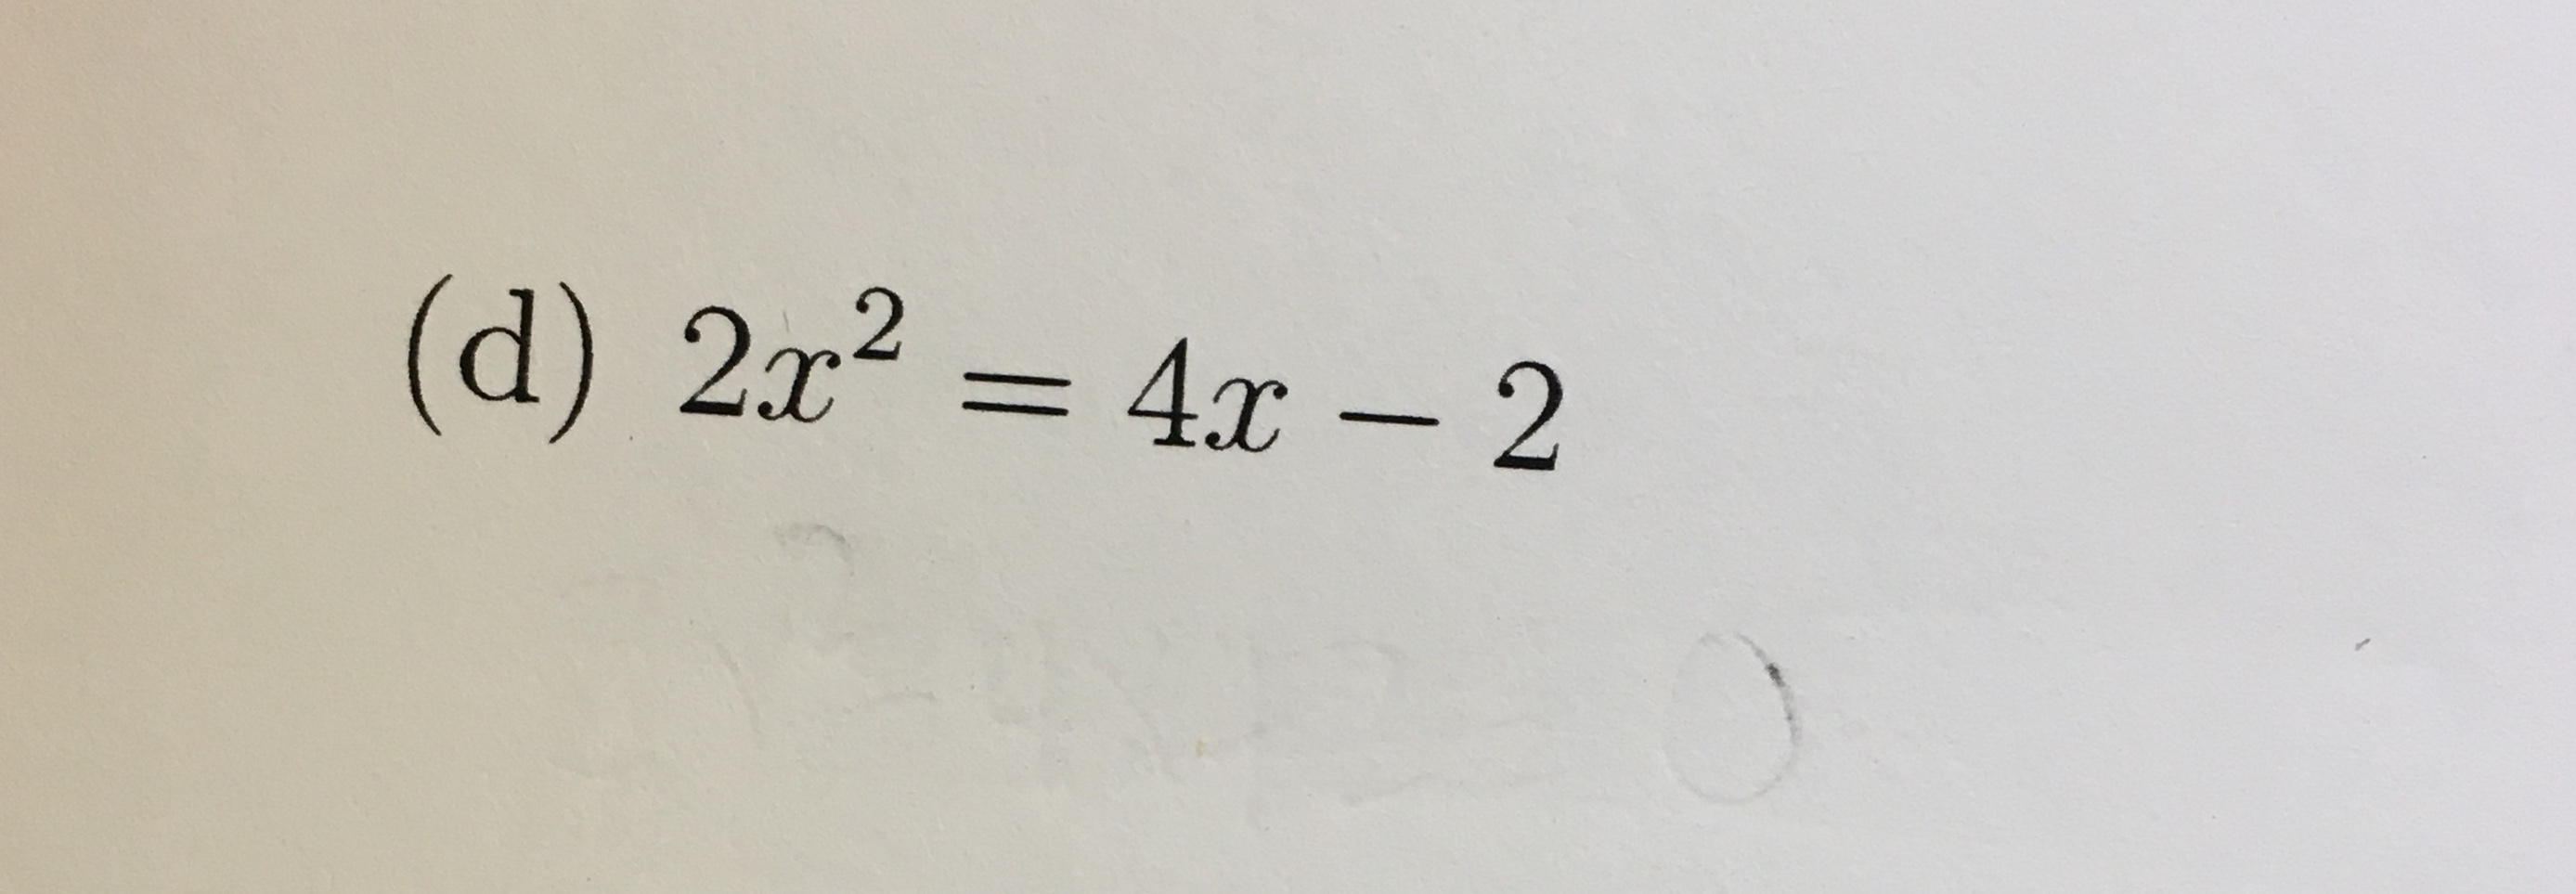 (d) 2x2=4x-2